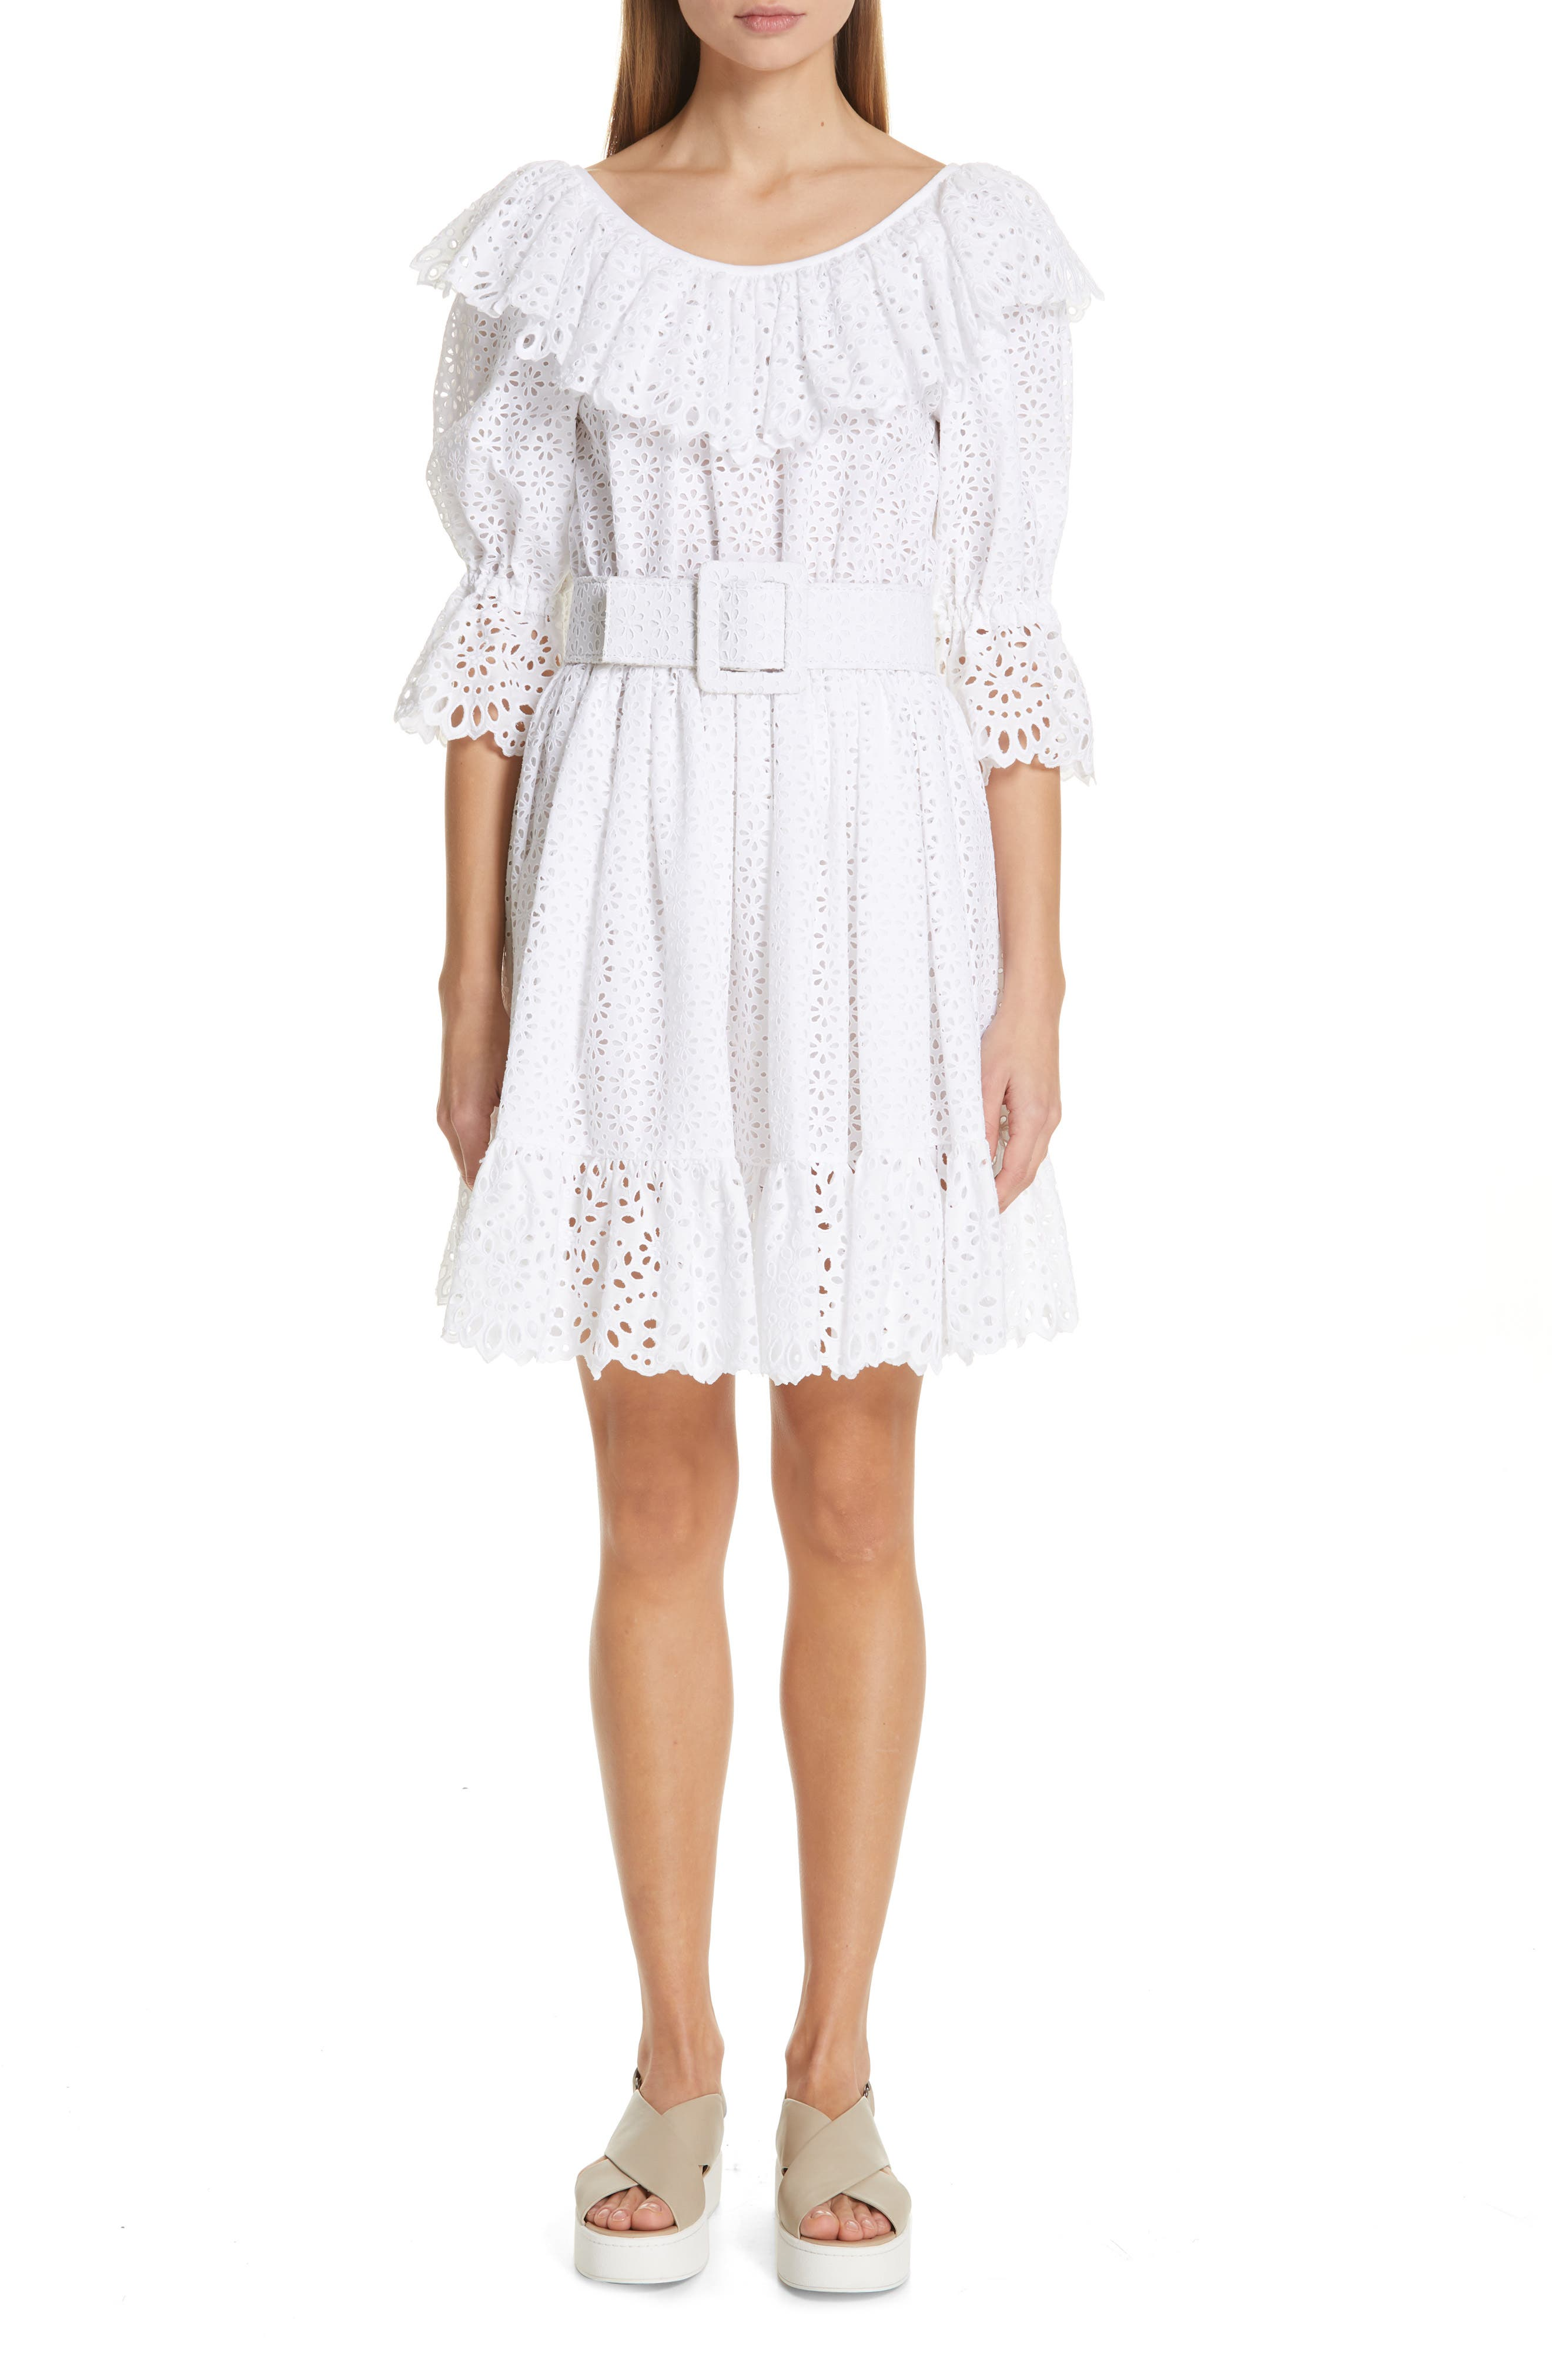 Michael Kors Eyelet Dirndl Dress, White